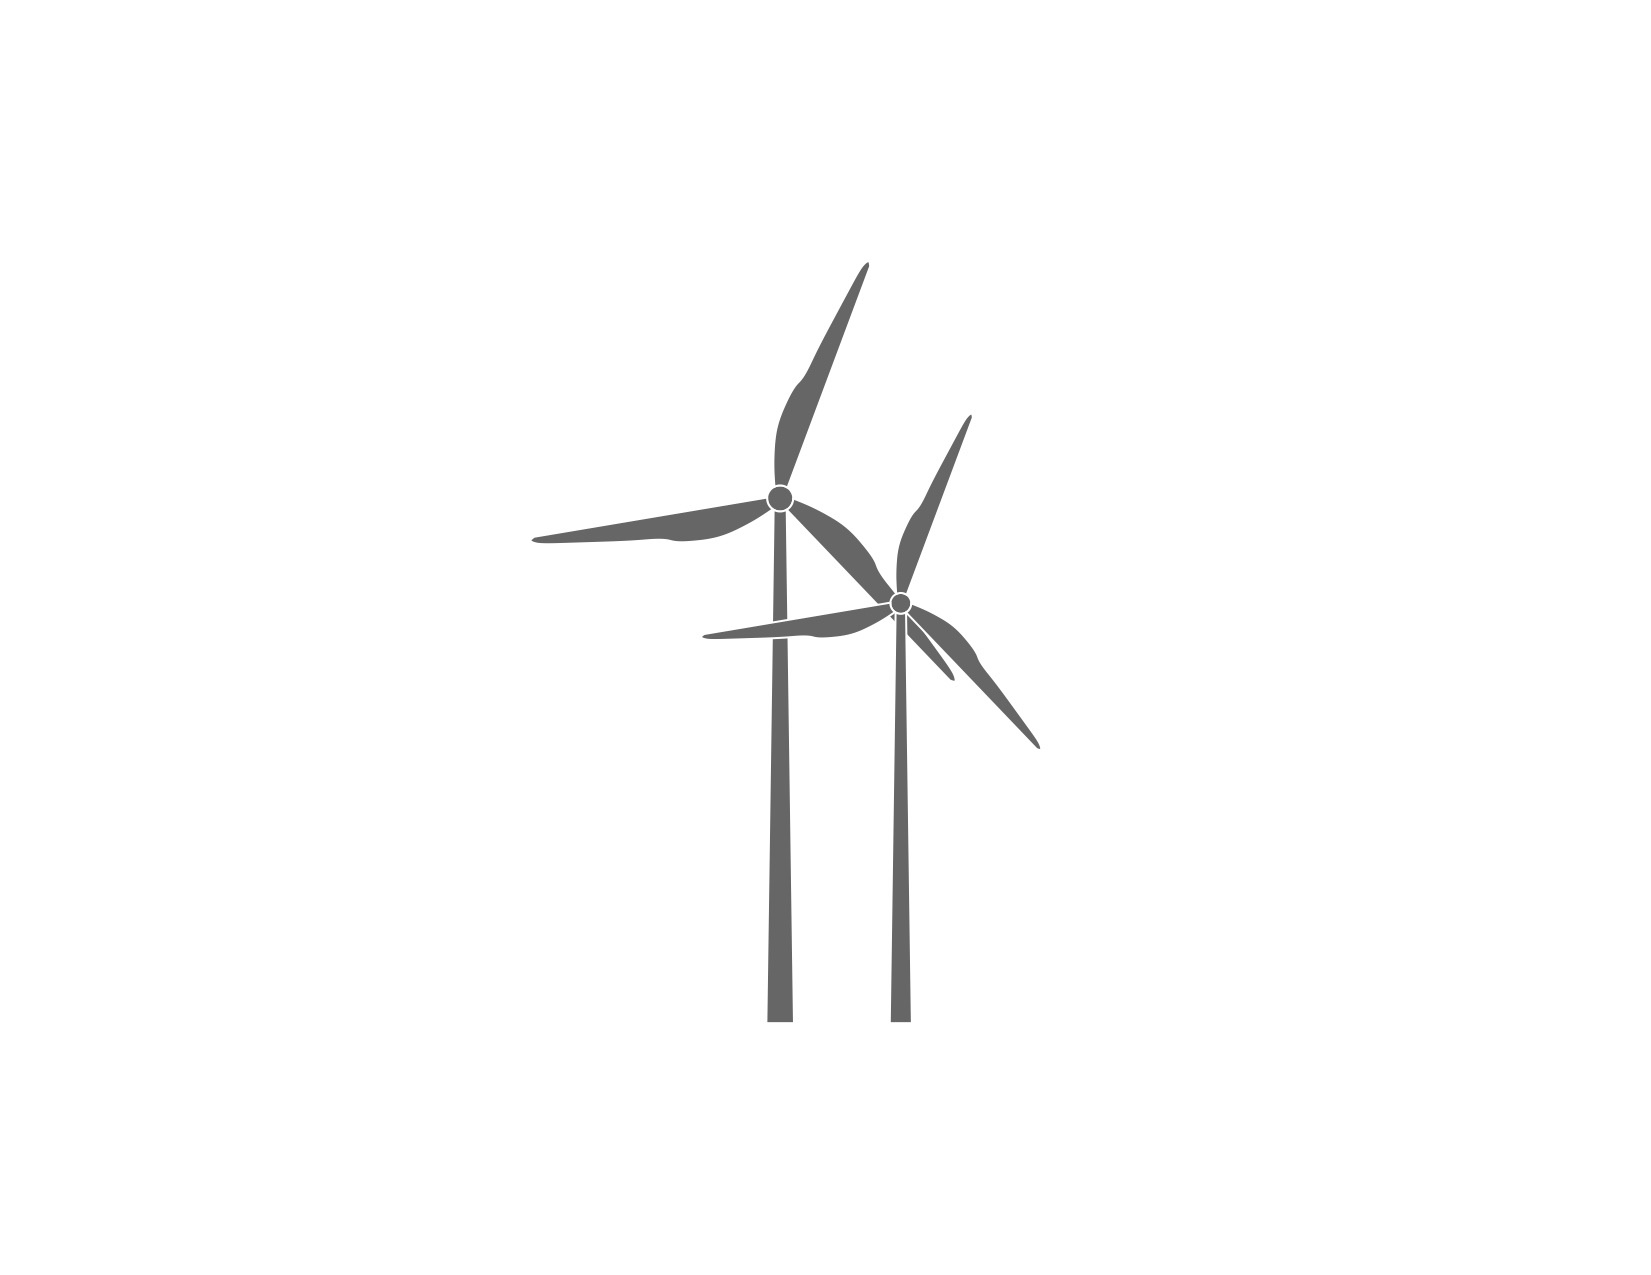 8 Symbol Of Wind Power Of Symbol Power Wind